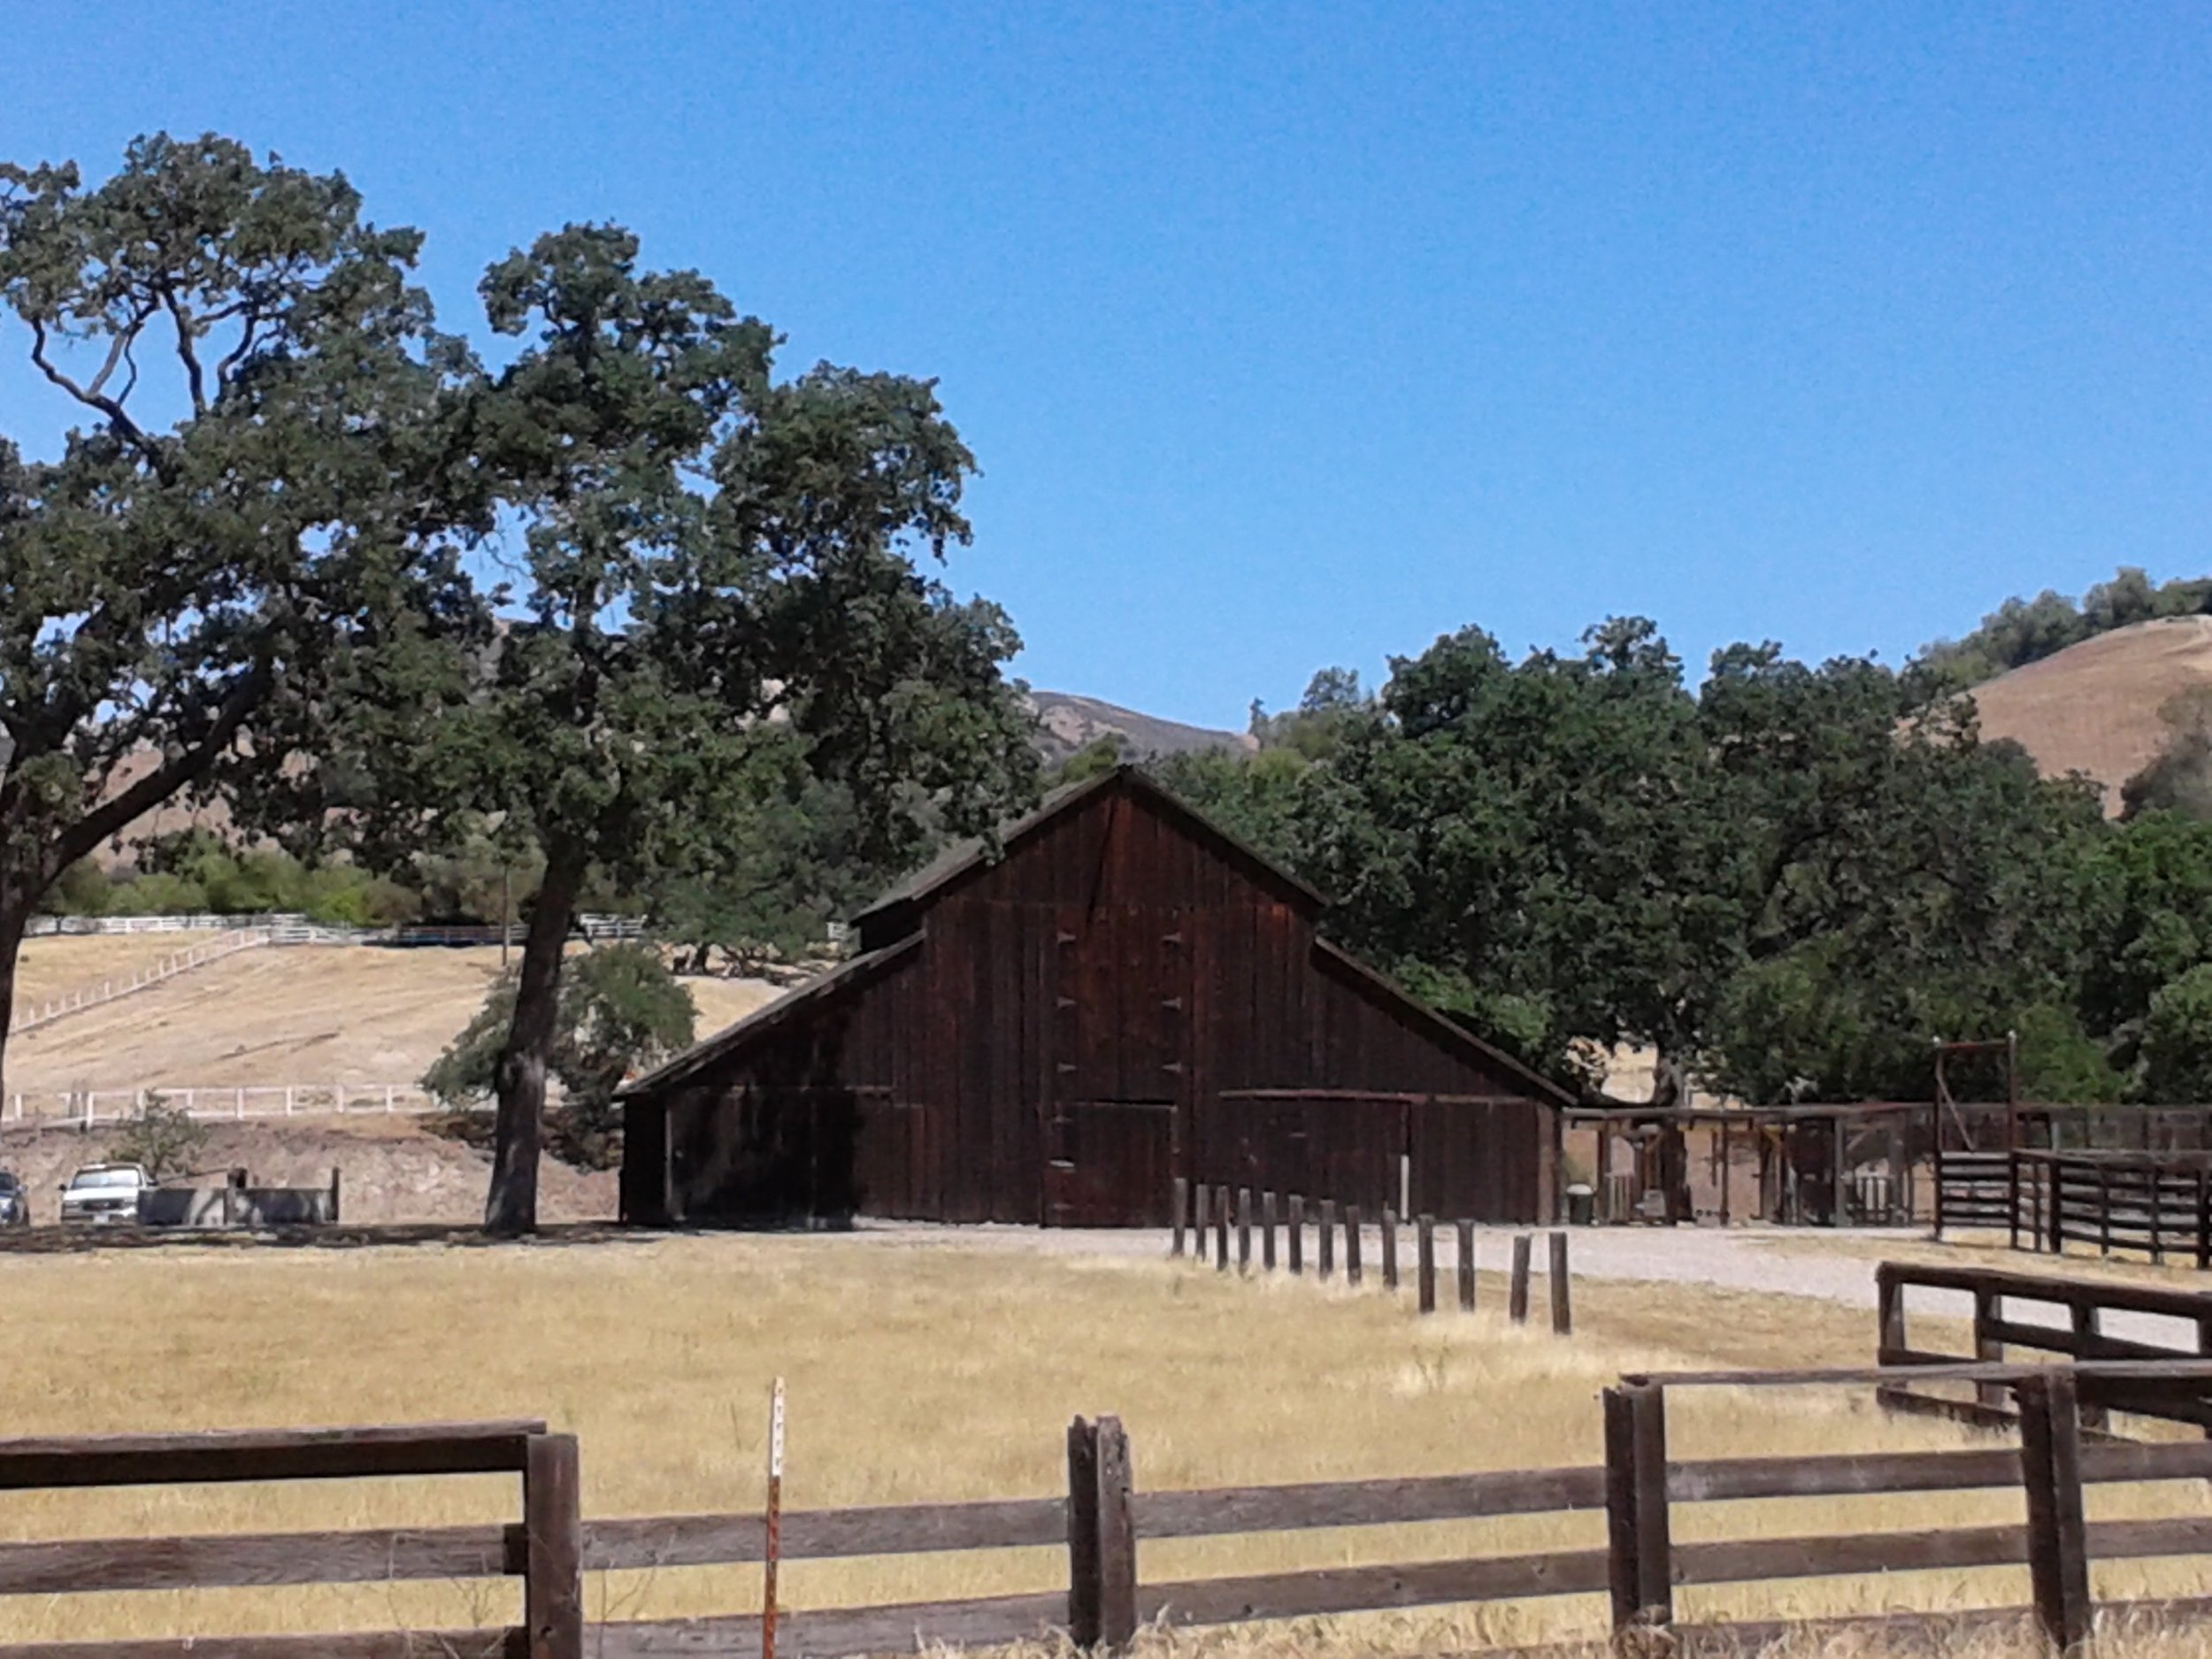 Live oak in the Santa Ynez Valley, CA